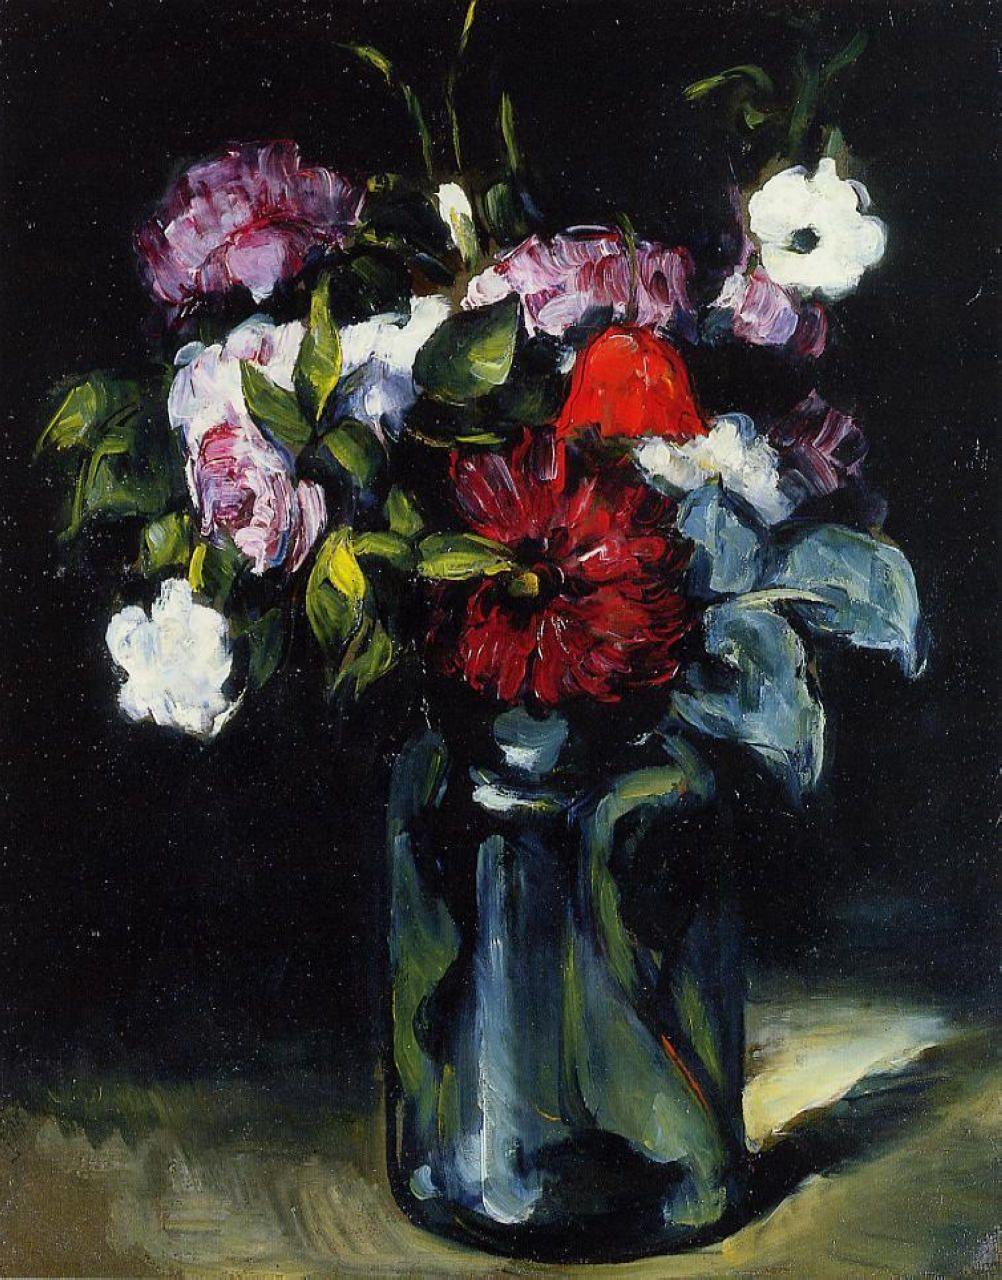 Flowers by post vase -  Flowers In A Vase Paul Cezanne 1873